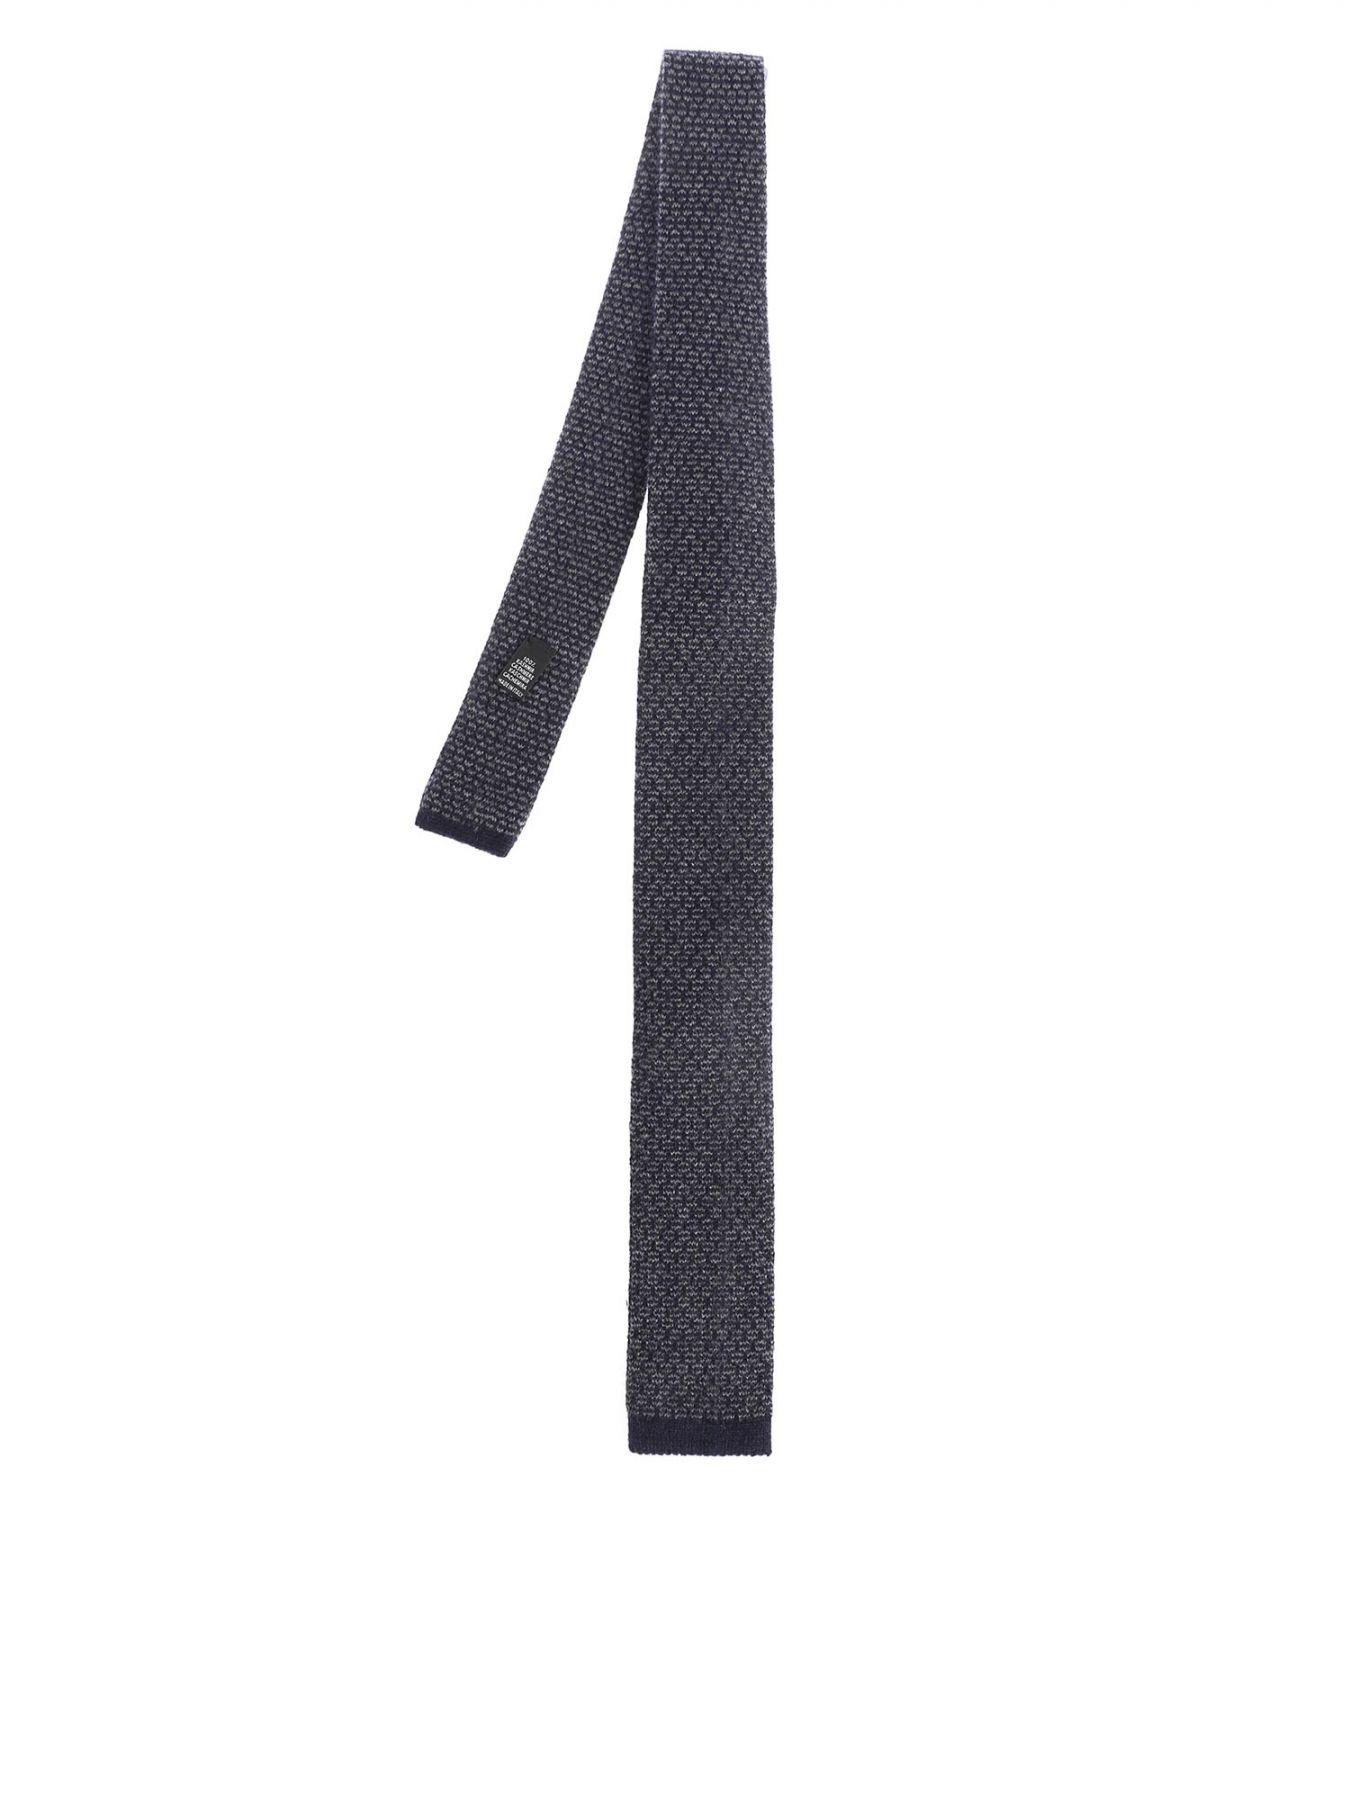 Roda Blue Cashmere Tie